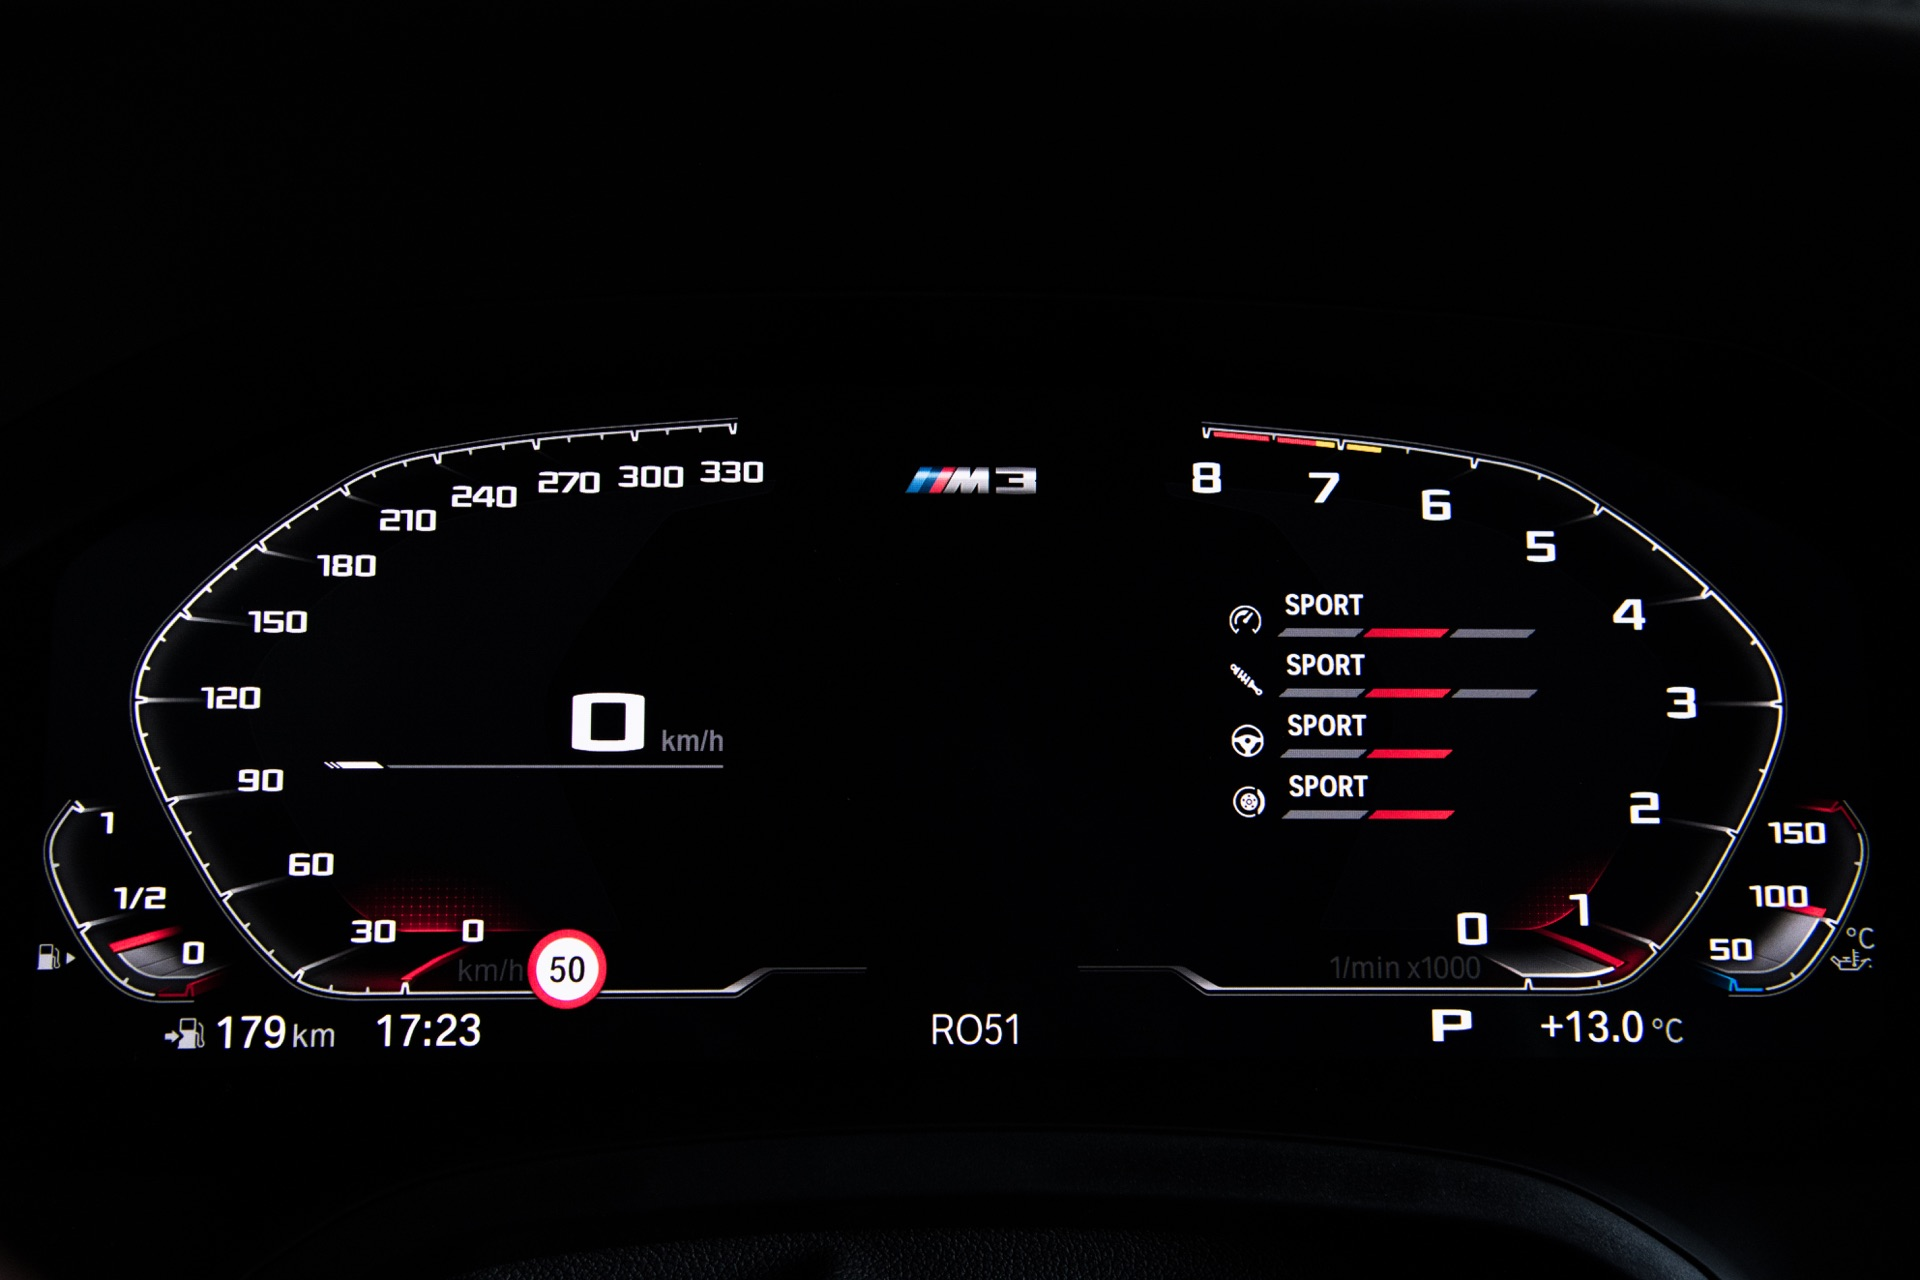 2022 BMW M3 speedo